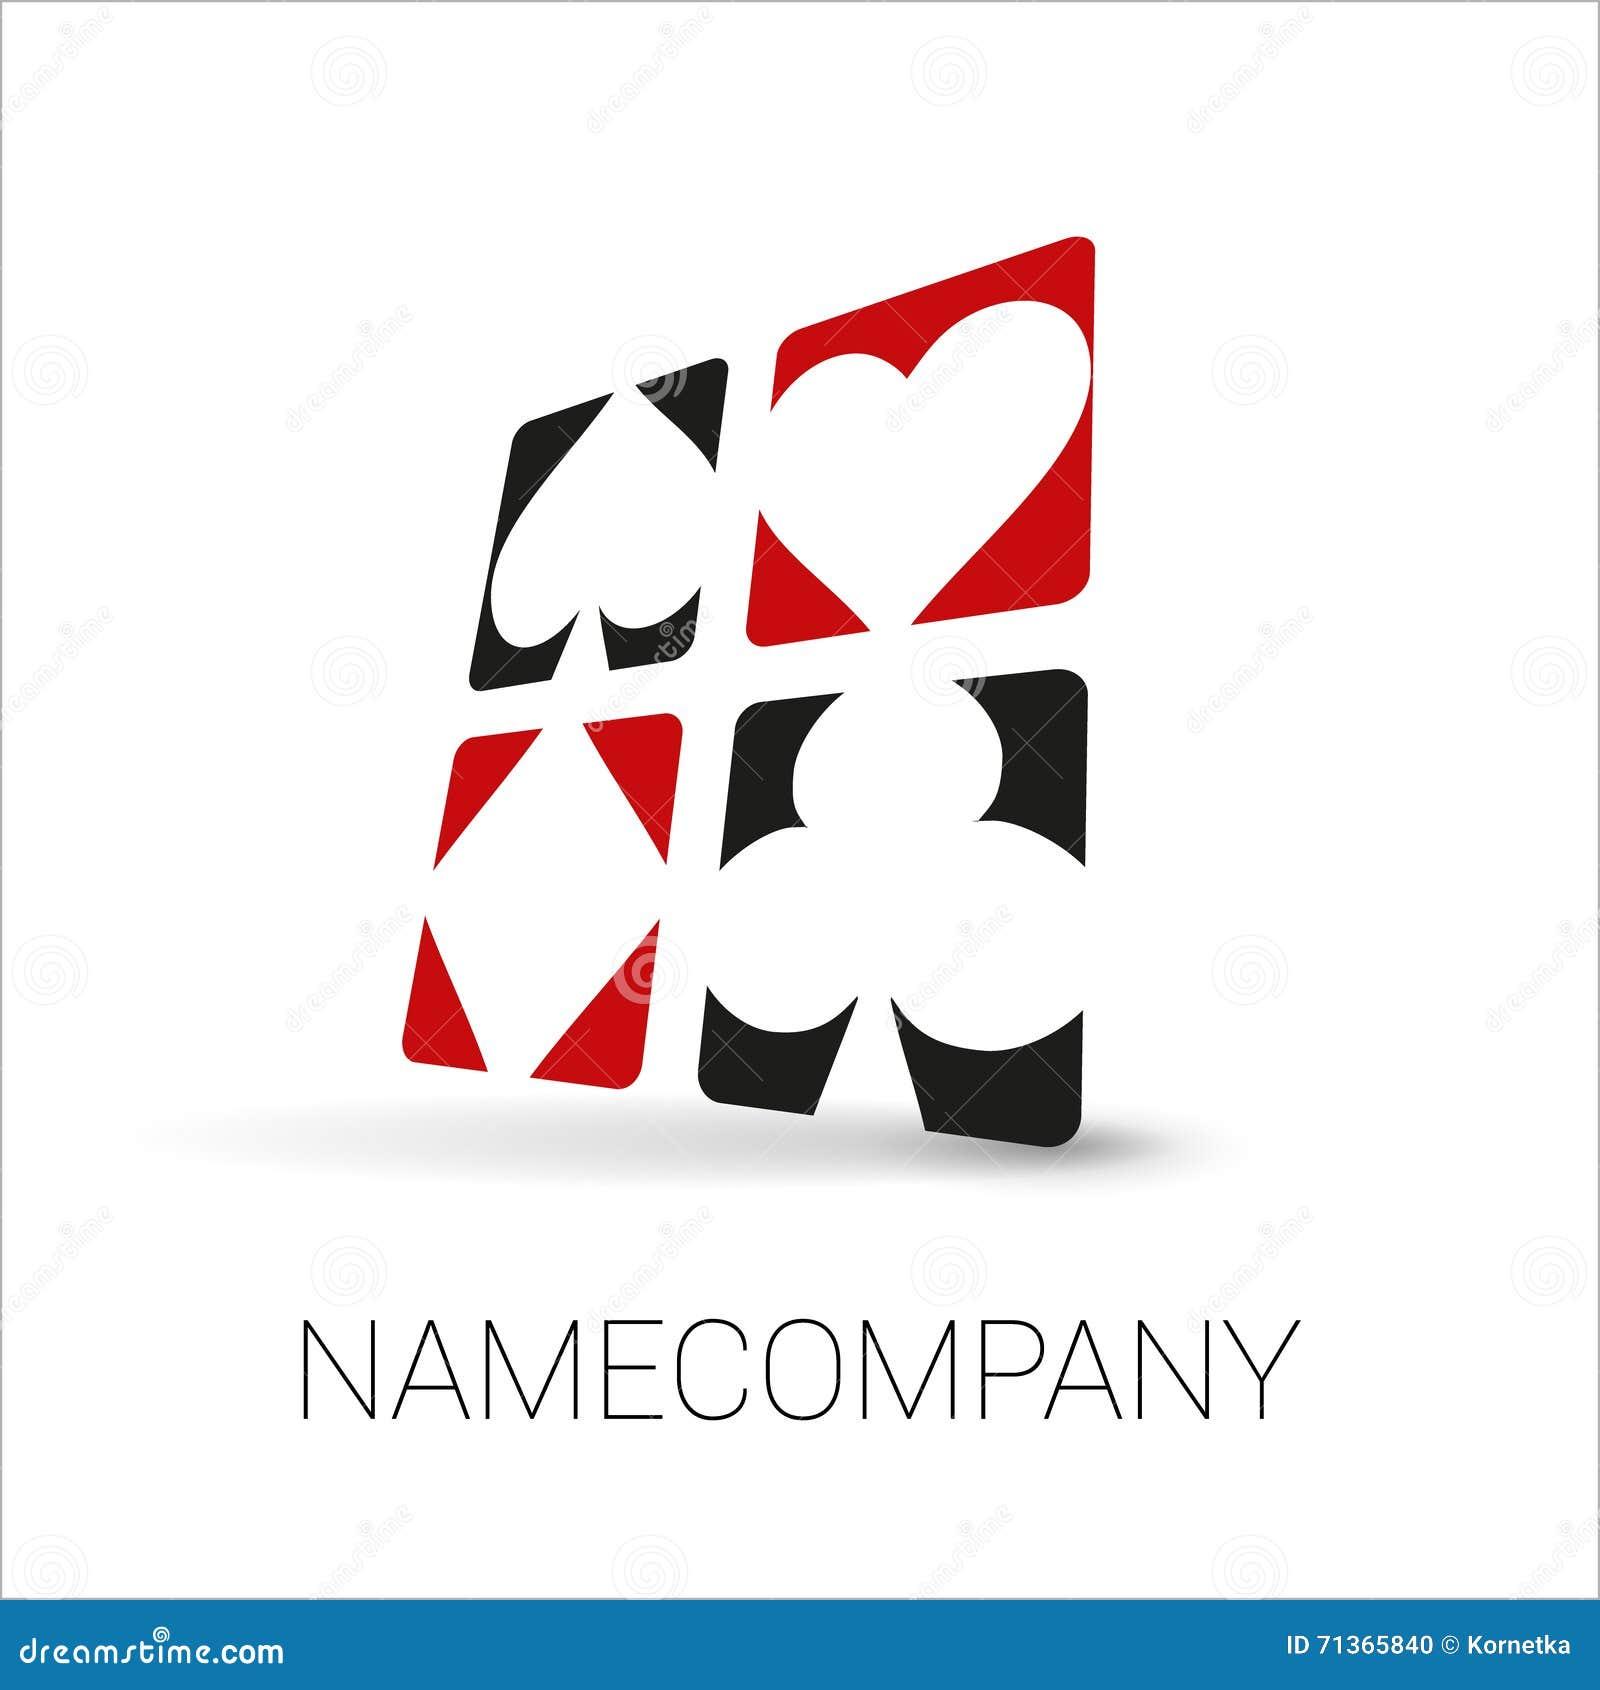 Playing card suit logo.